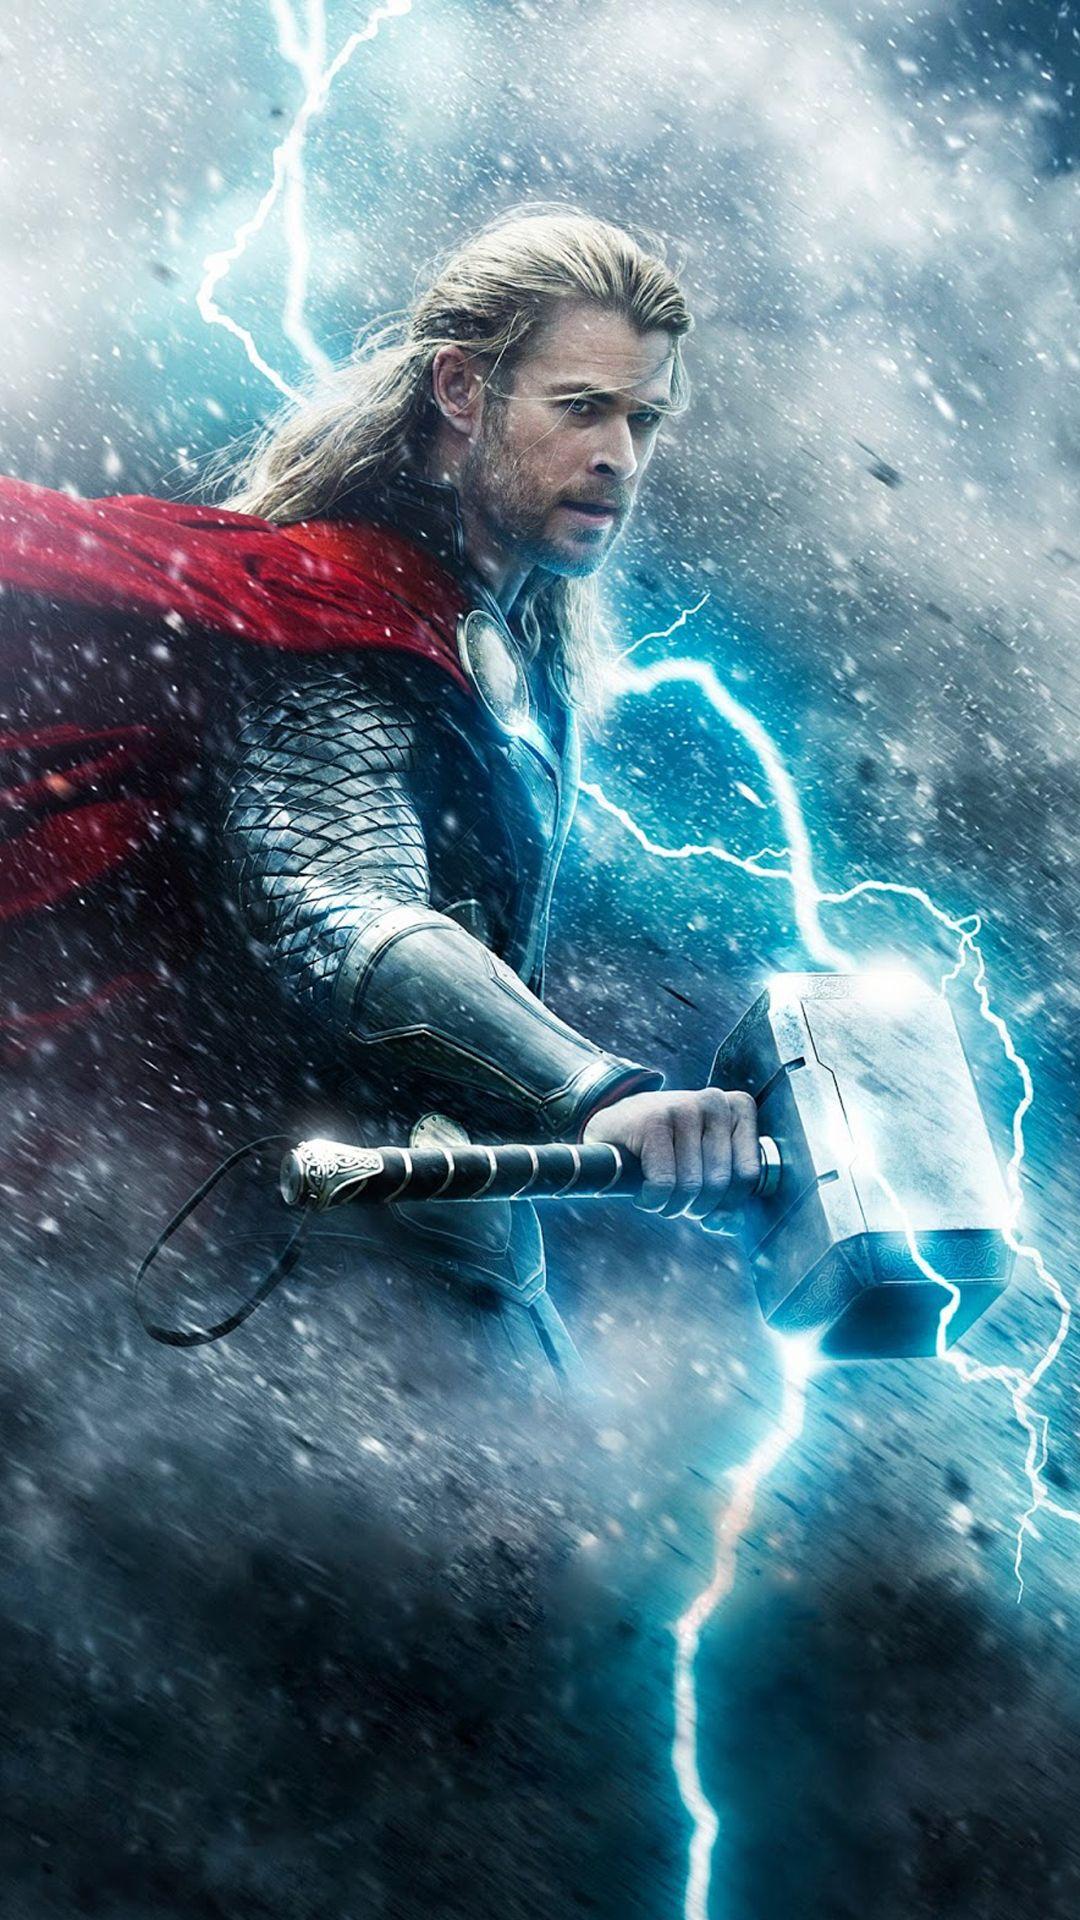 Cooliphonewallpapers Net In 2020 The Dark World World Movies Chris Hemsworth Thor